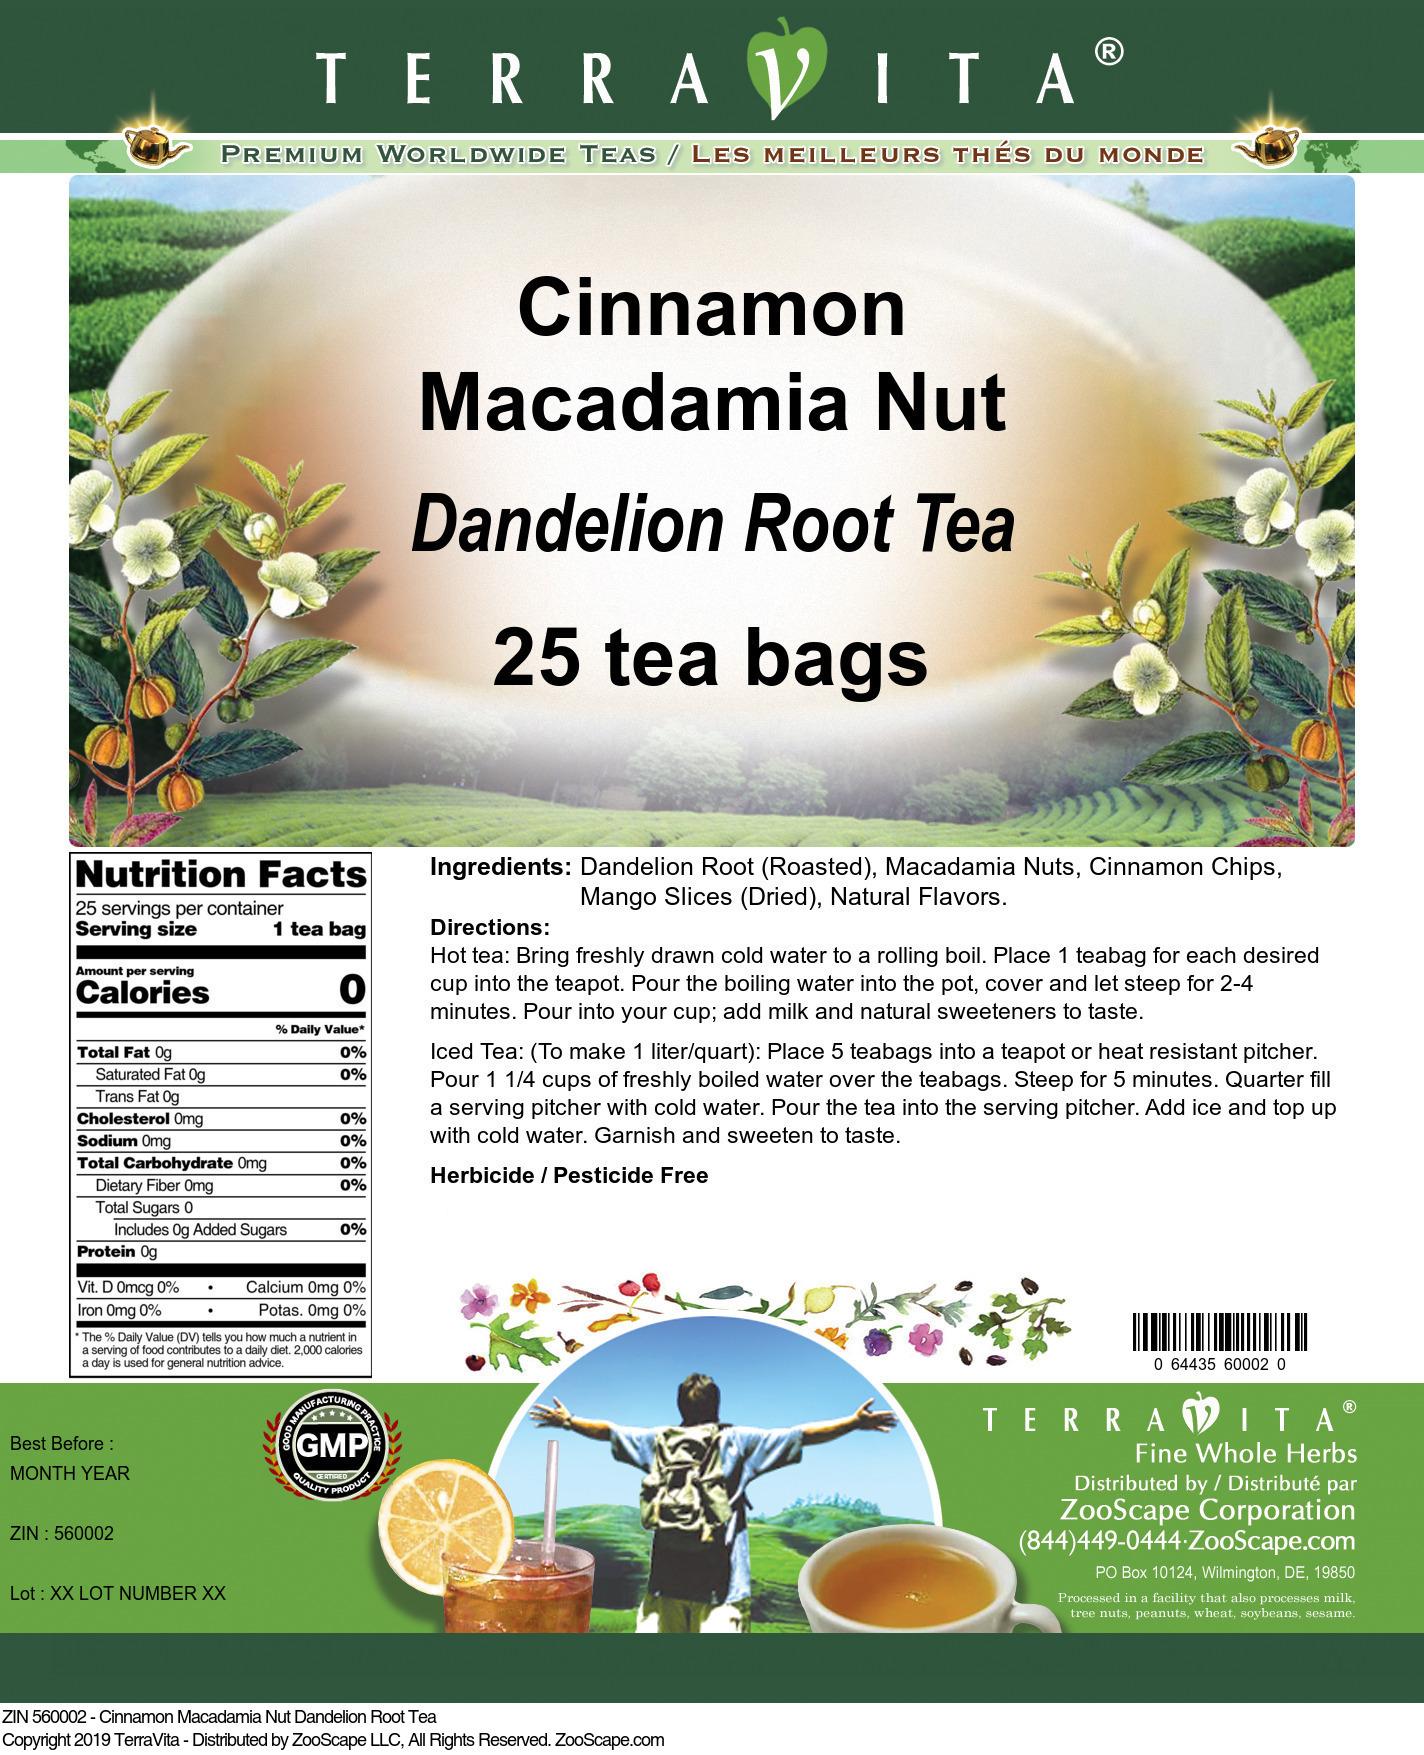 Cinnamon Macadamia Nut Dandelion Root